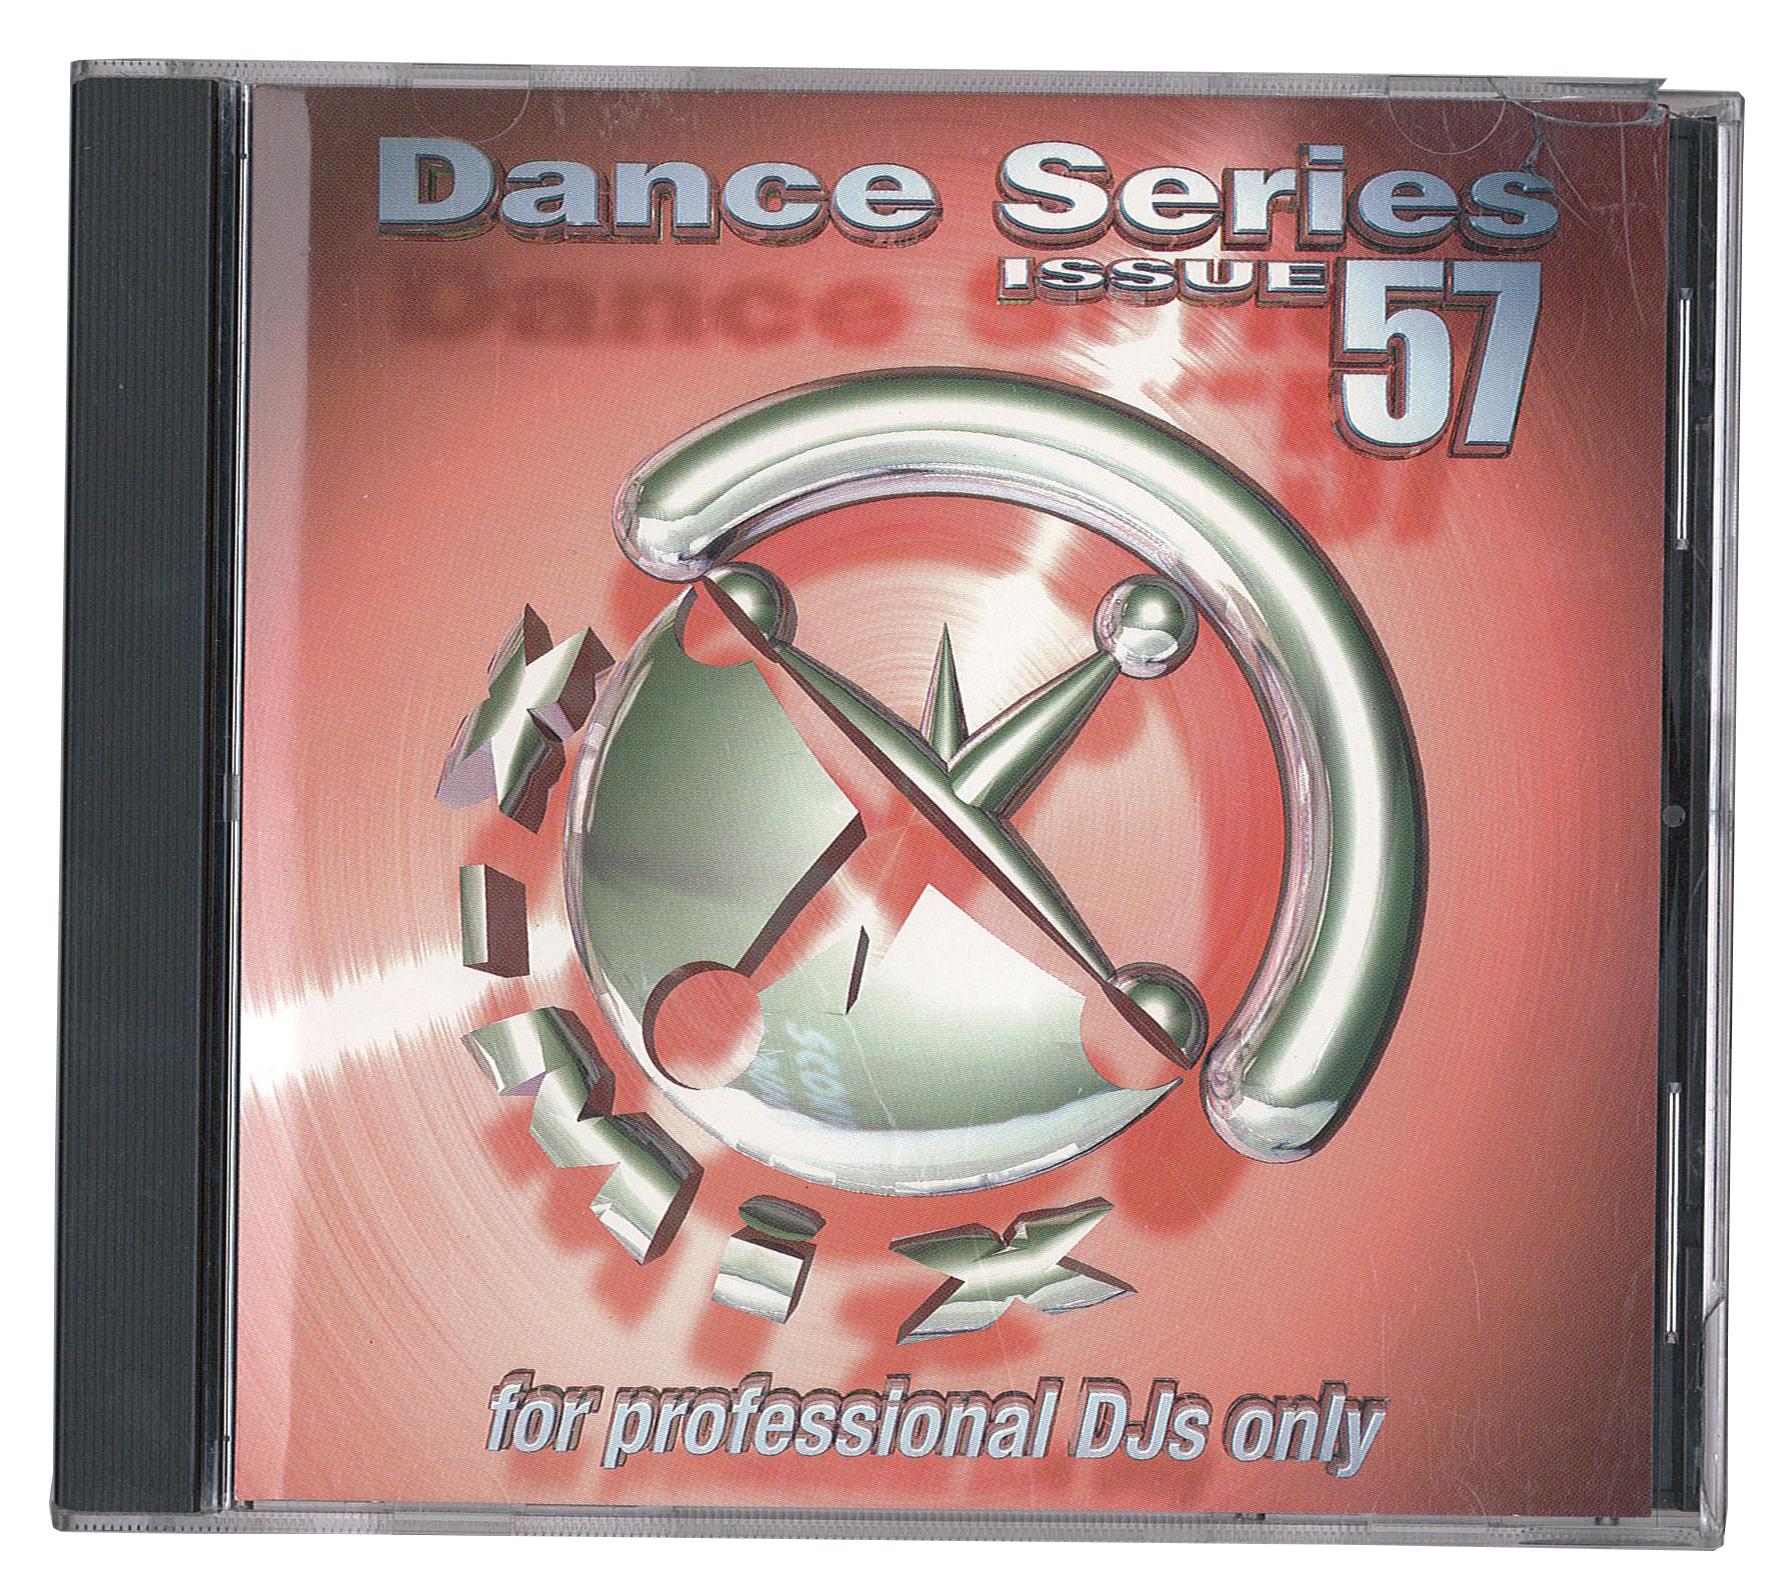 WLWLTDOO-2000-CD-XMIX_DANCE_57-FRONT-XD572.jpg